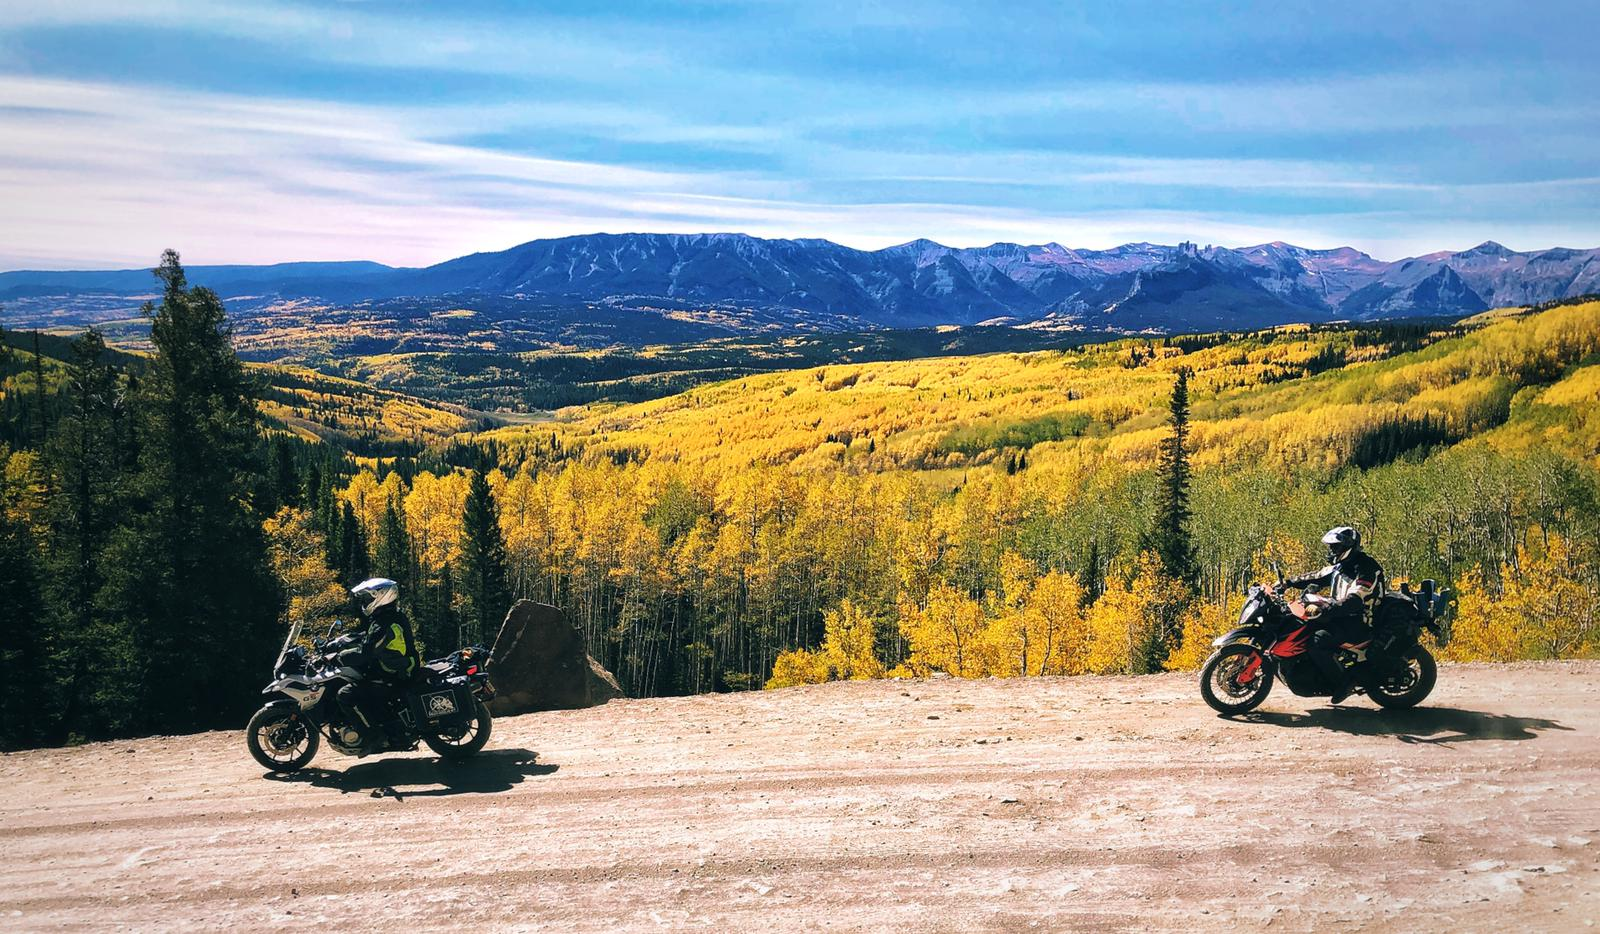 Explore the Backroads of Colorado